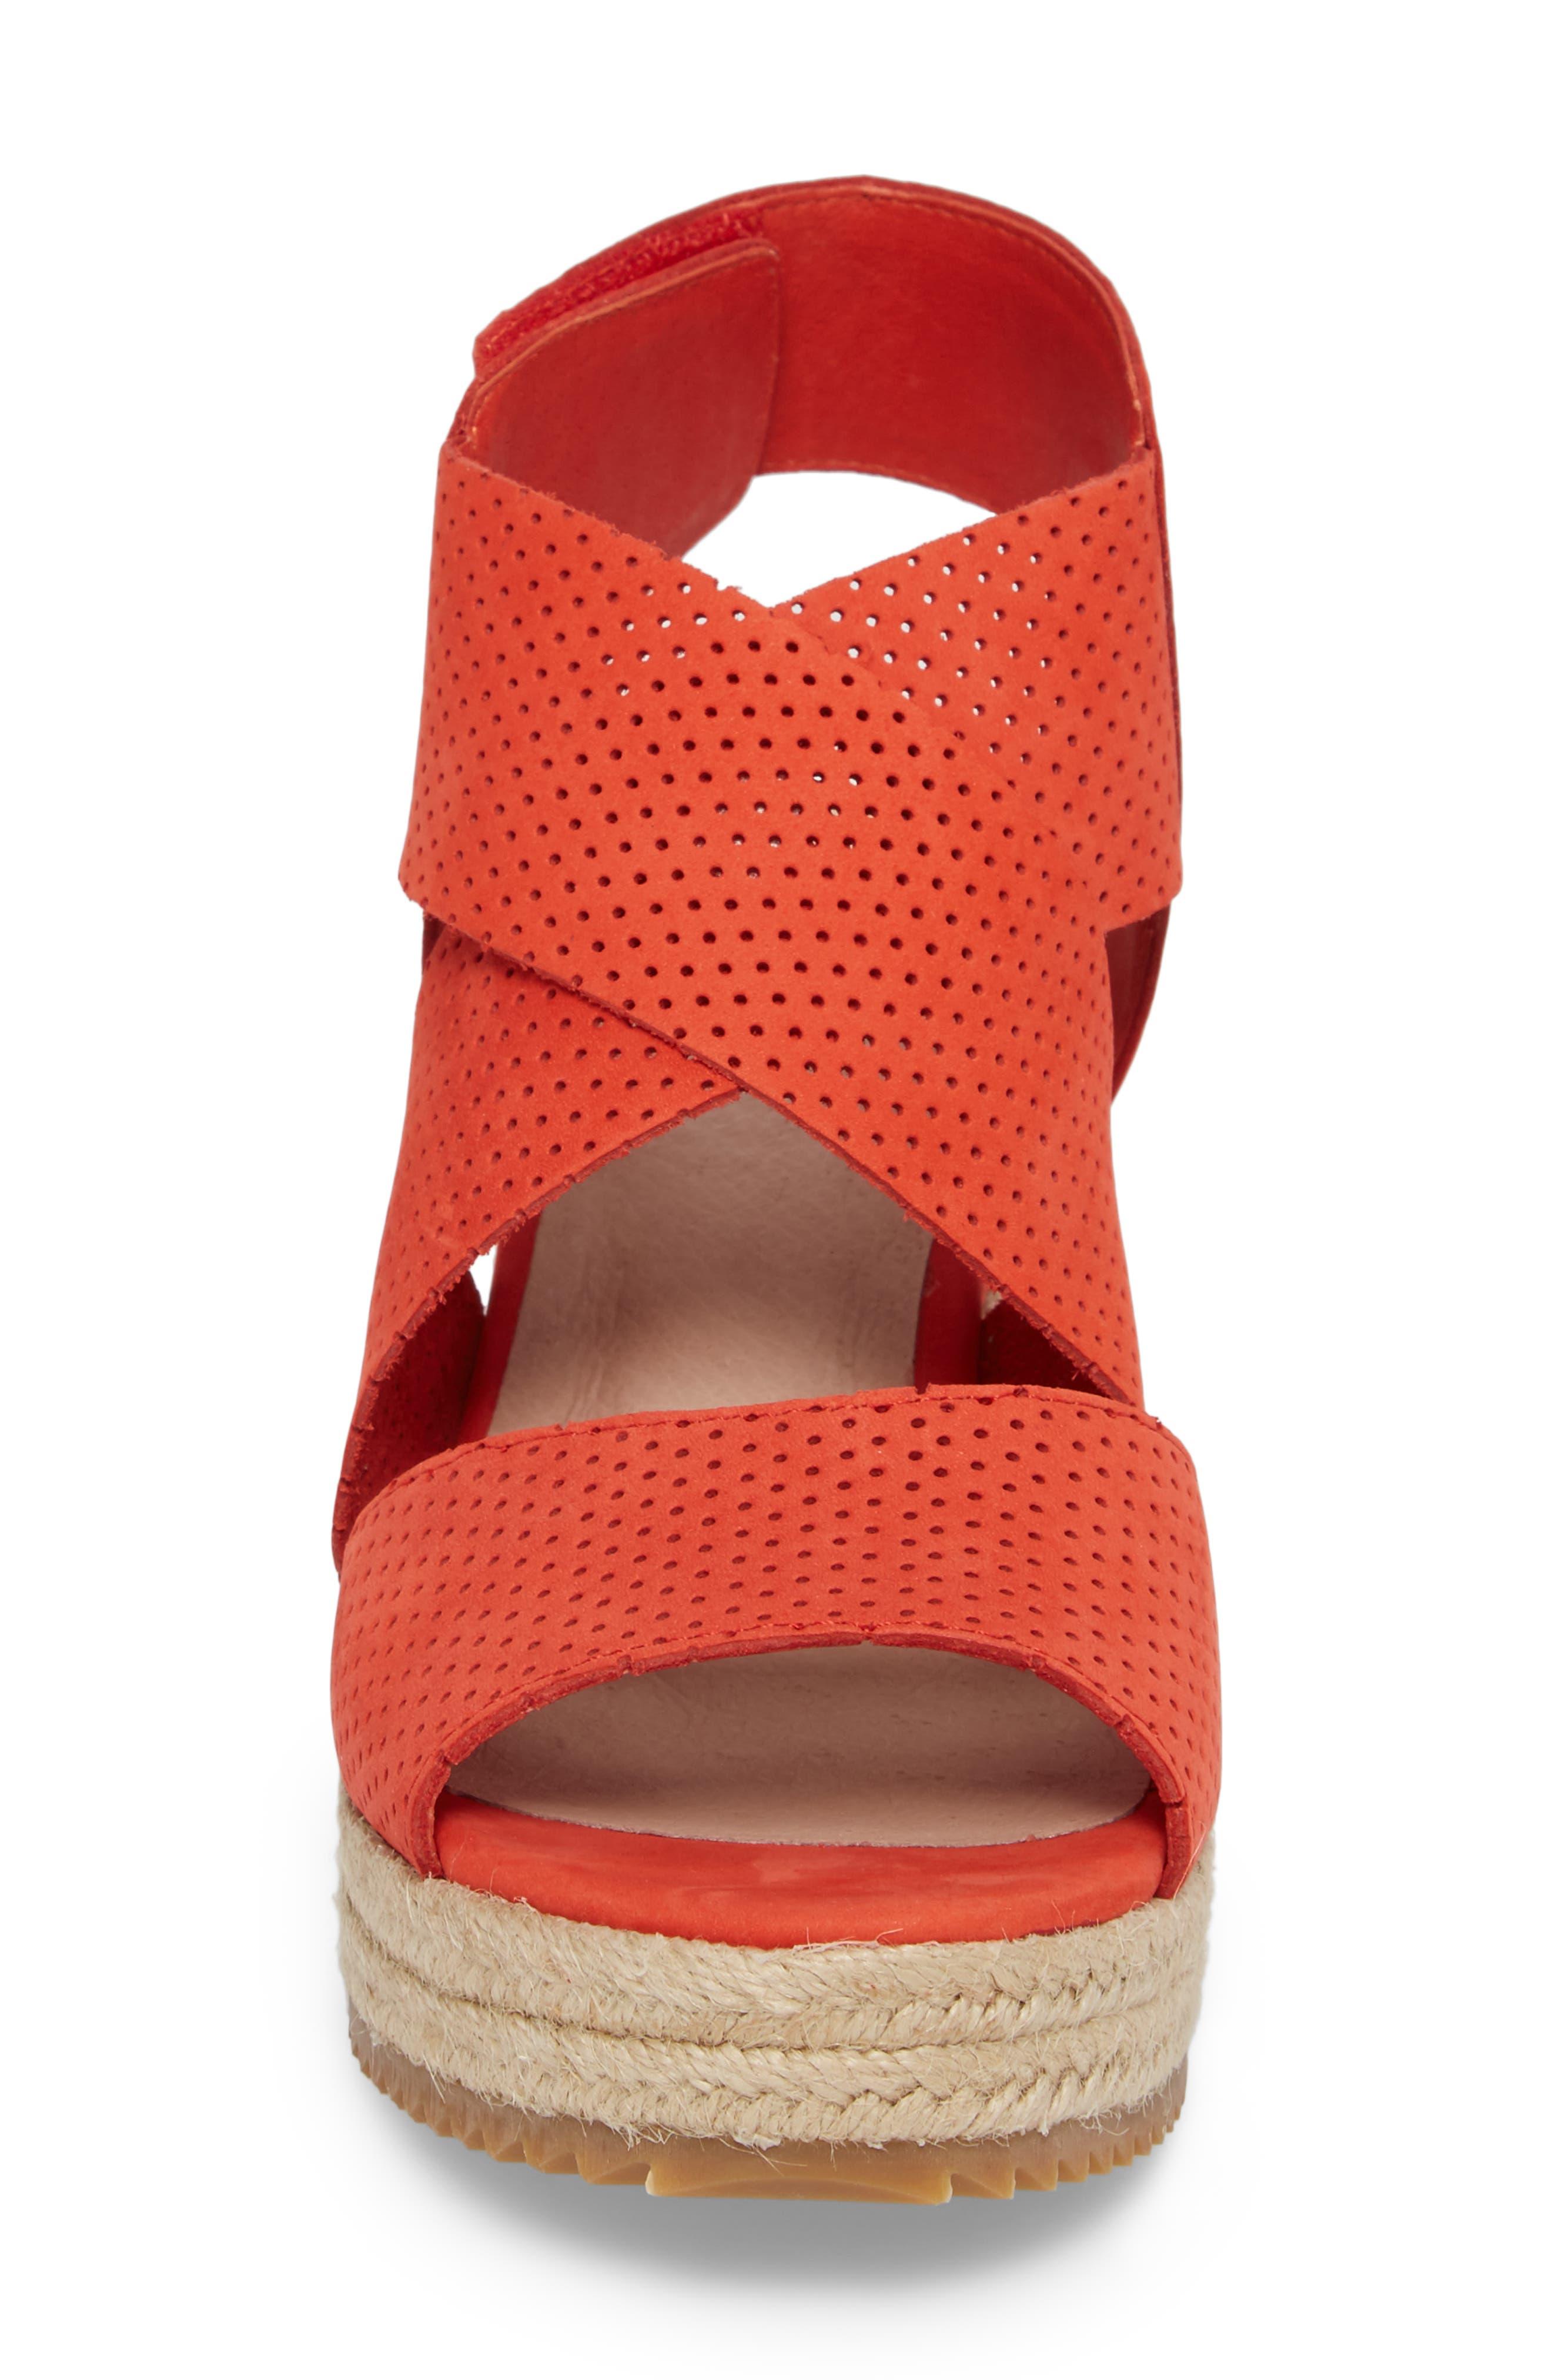 'Willow' Espadrille Wedge Sandal,                             Alternate thumbnail 4, color,                             PERSIMMON NUBUCK